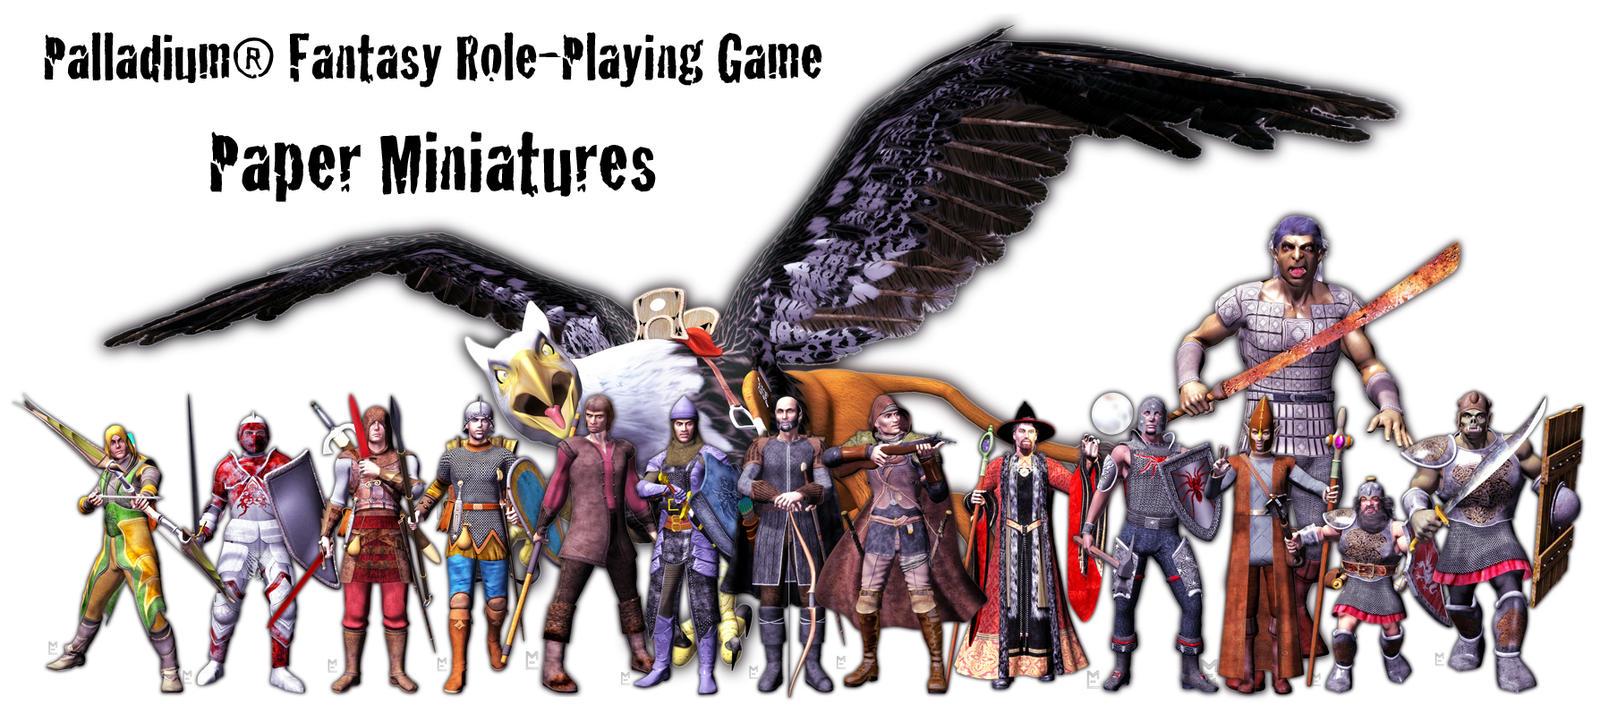 Palladium Fantasy RPG Miniatures Teaser by MADMANMIKE